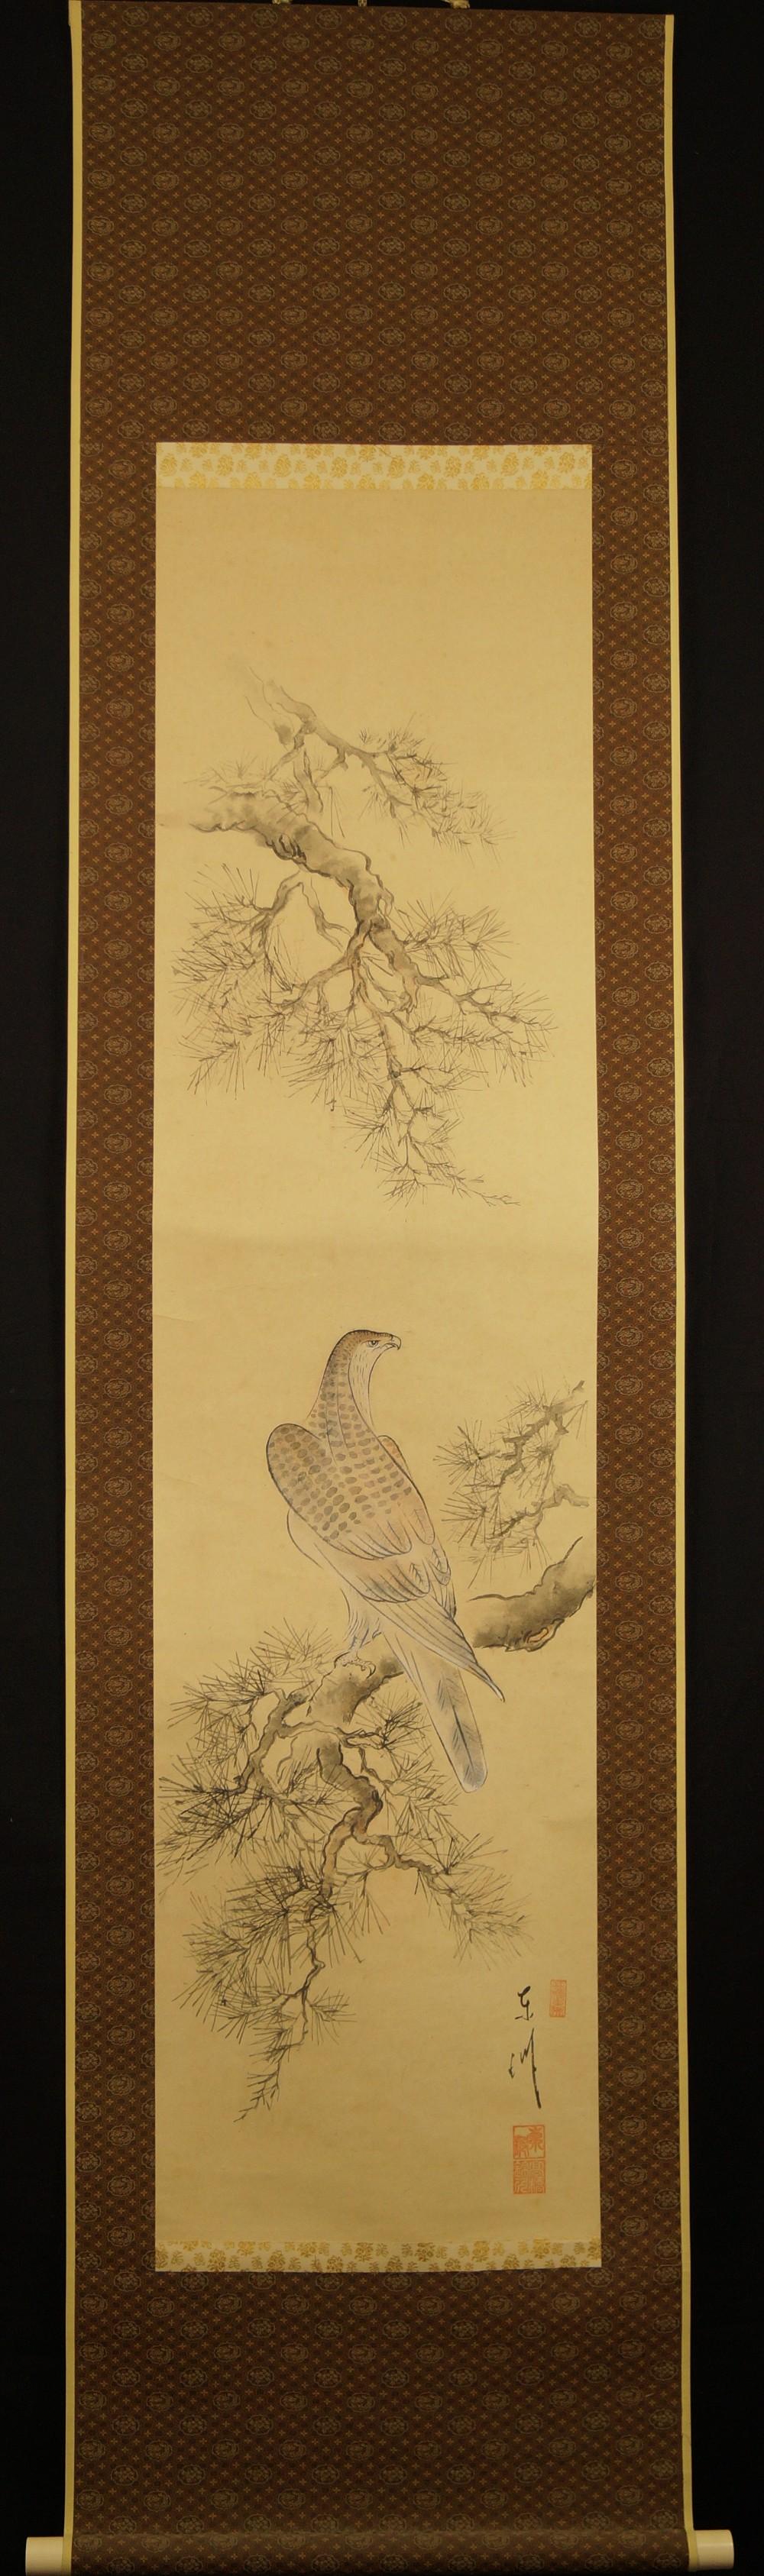 Falke - Japanisches Rollbild (Kakejiku, Kakemono)